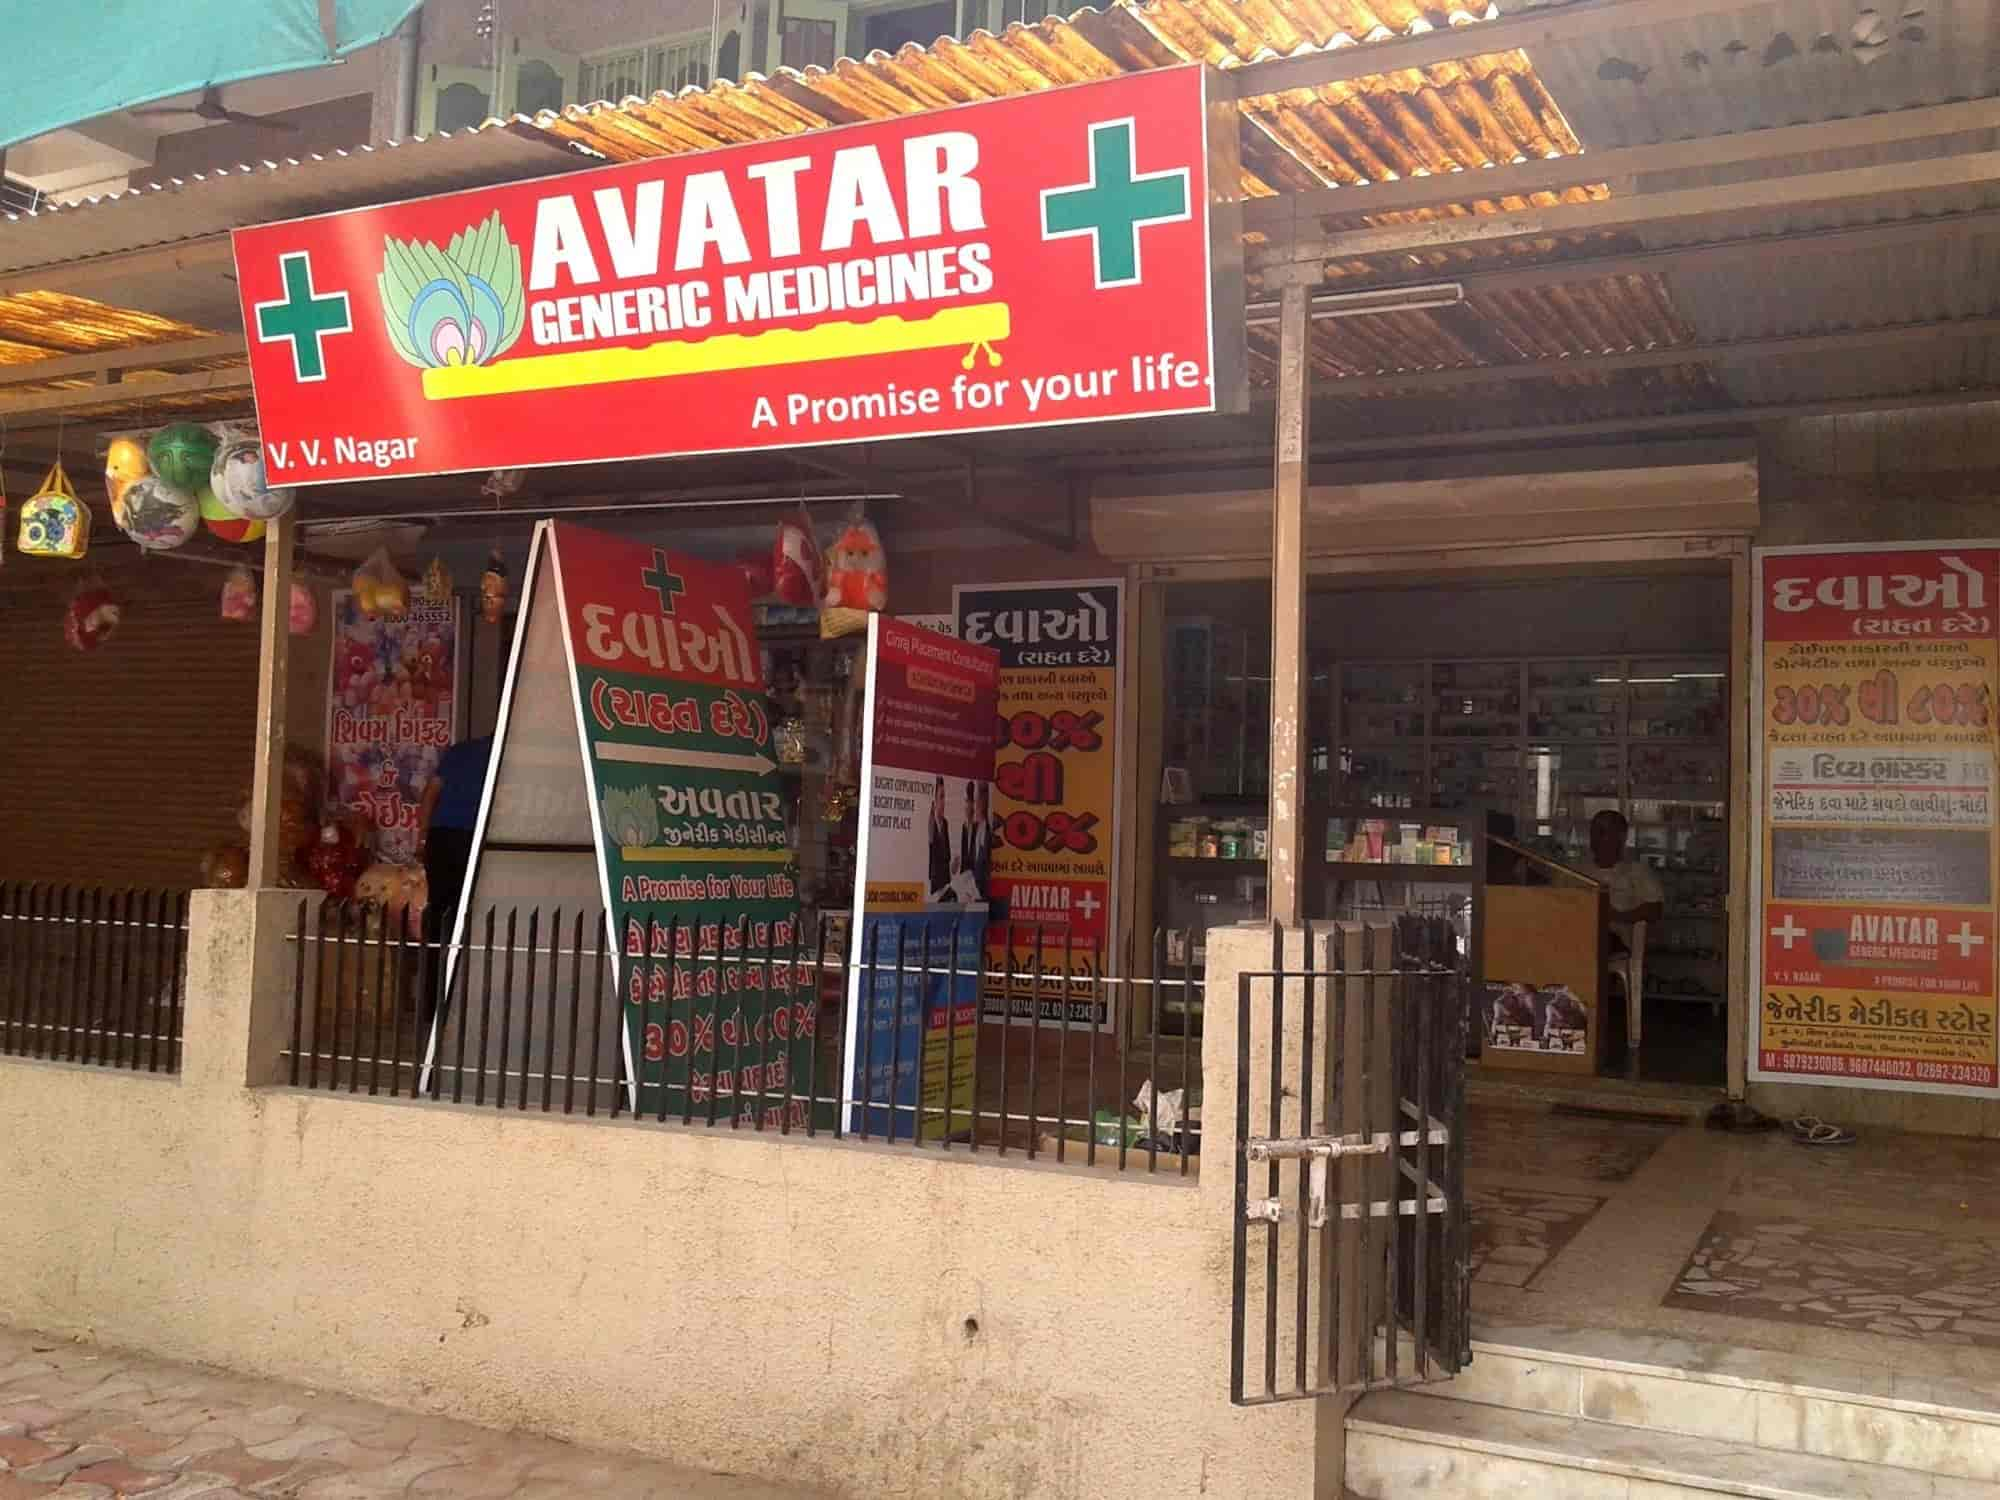 Avatar Generic Medicines Store, Vallabh Vidyanagar